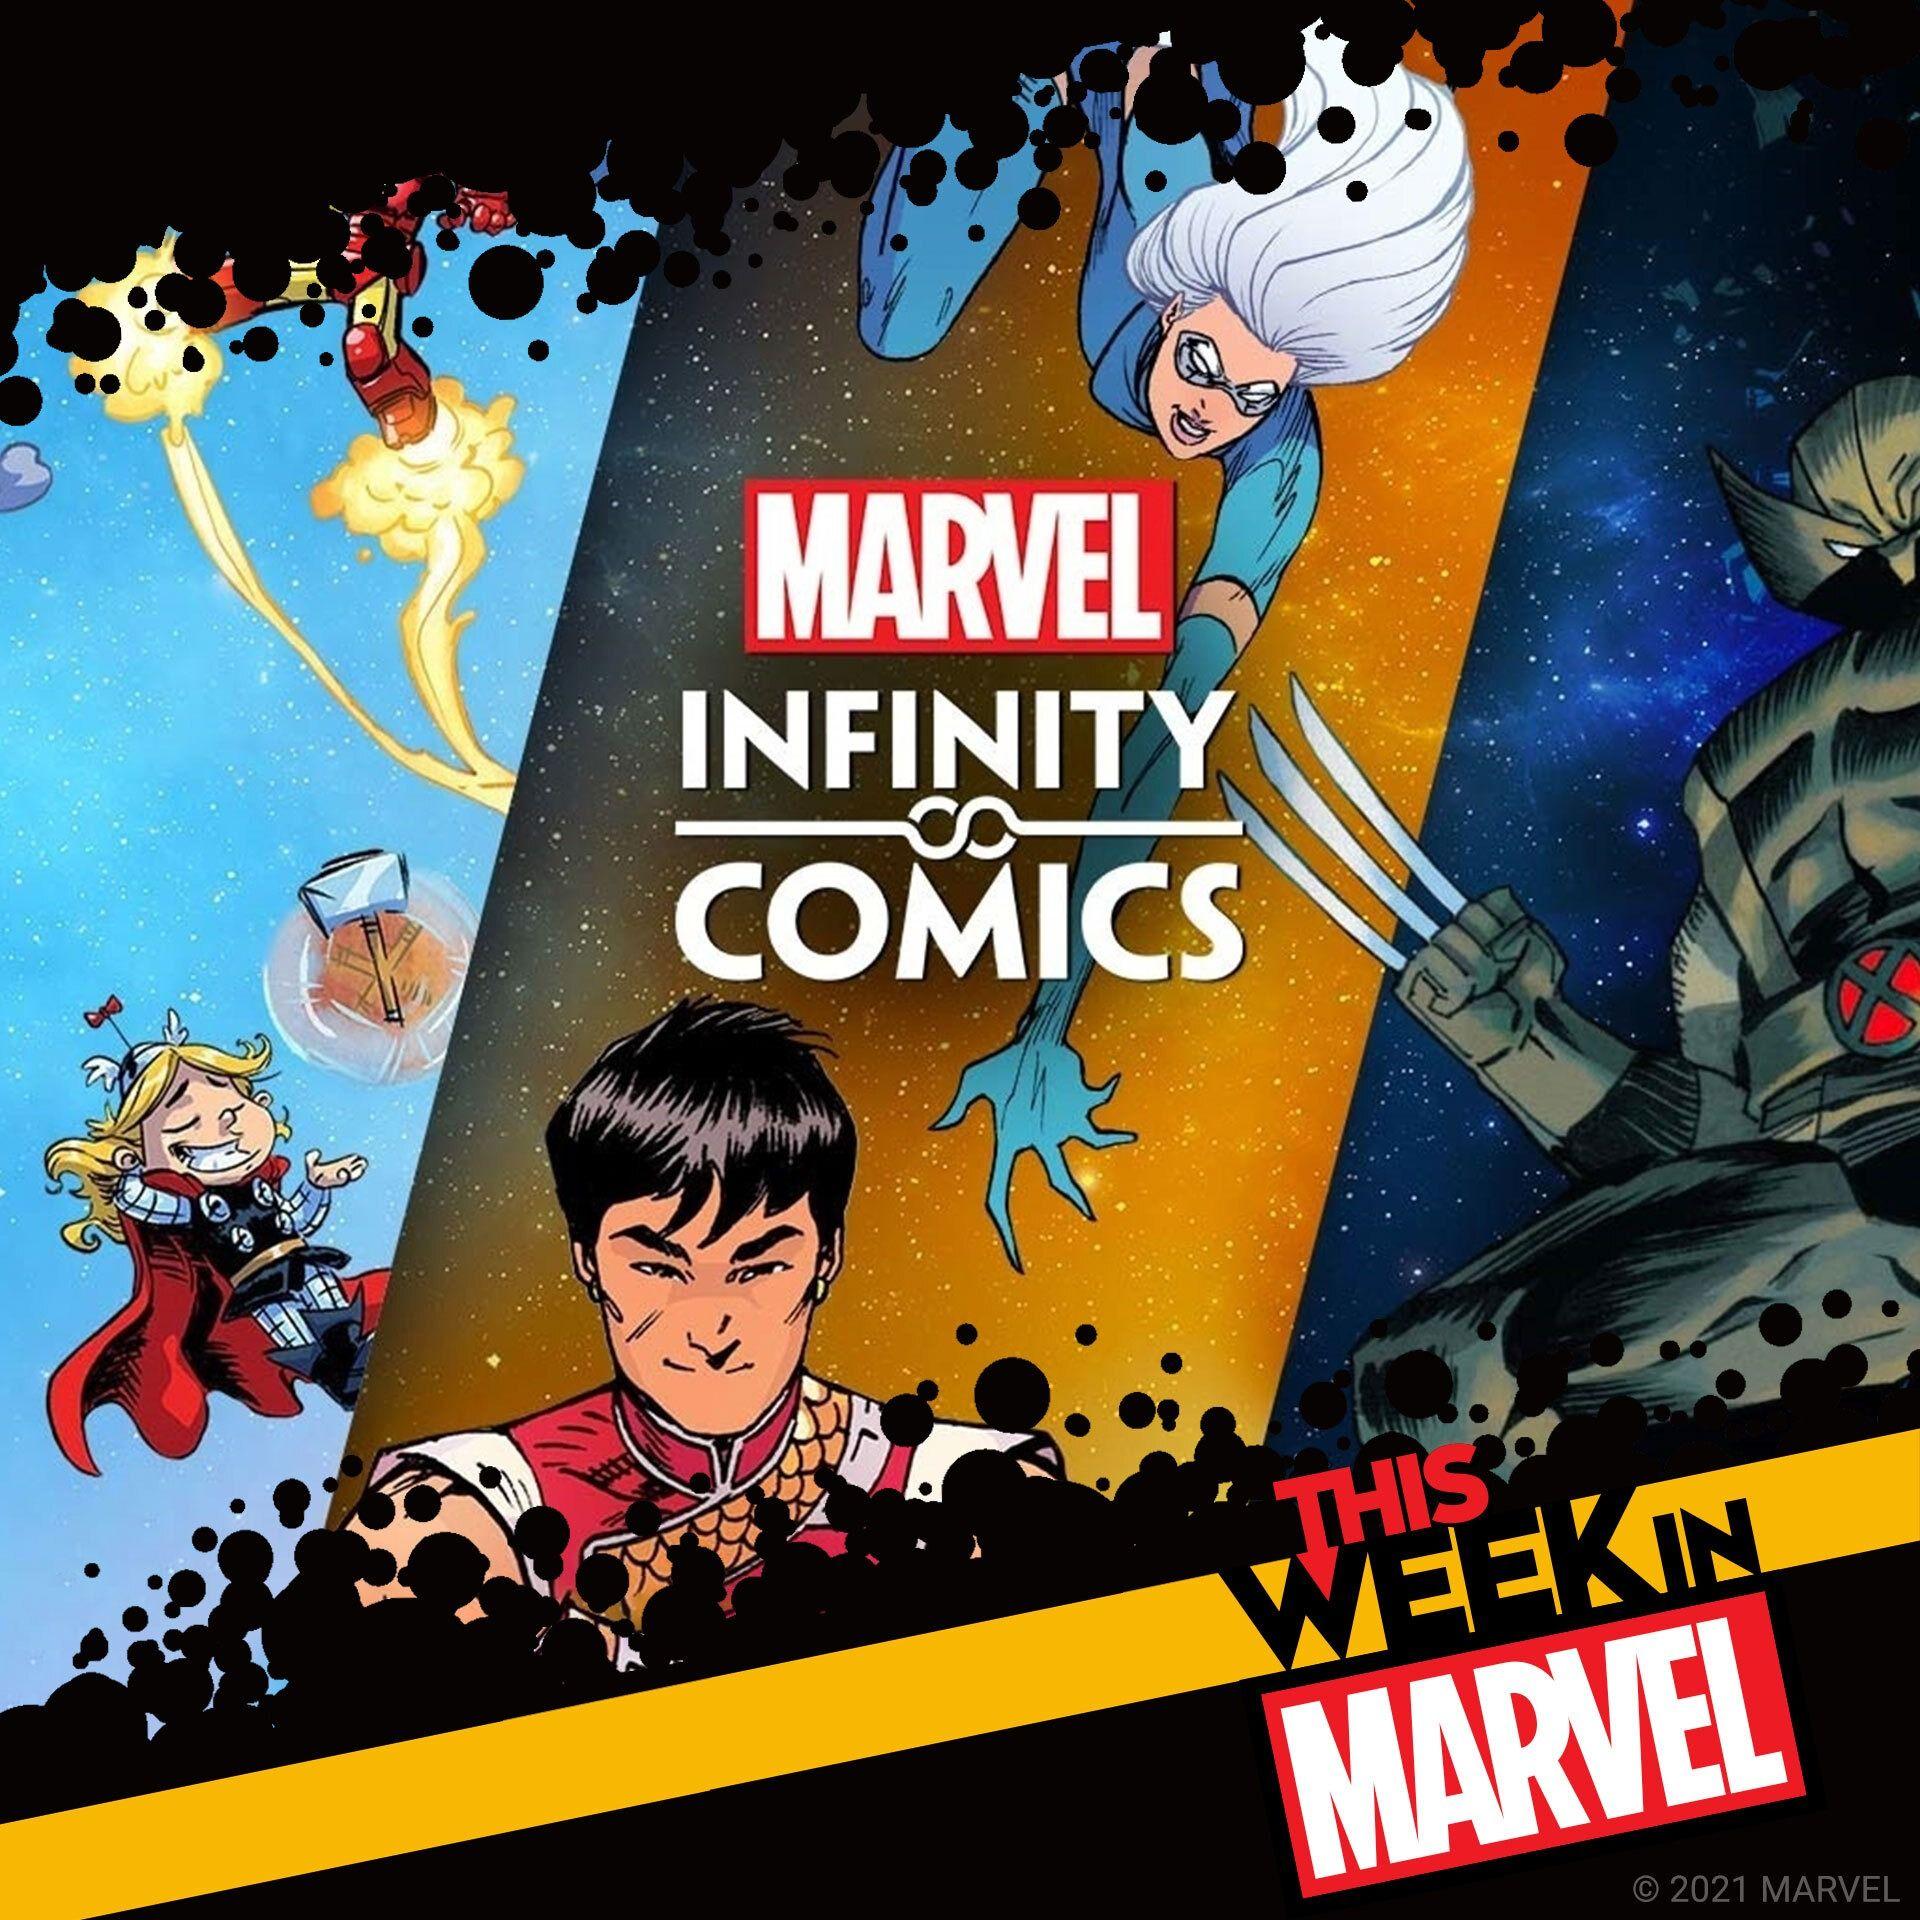 New Wolverine & Spider-Man Games, Major Comics News, & More!